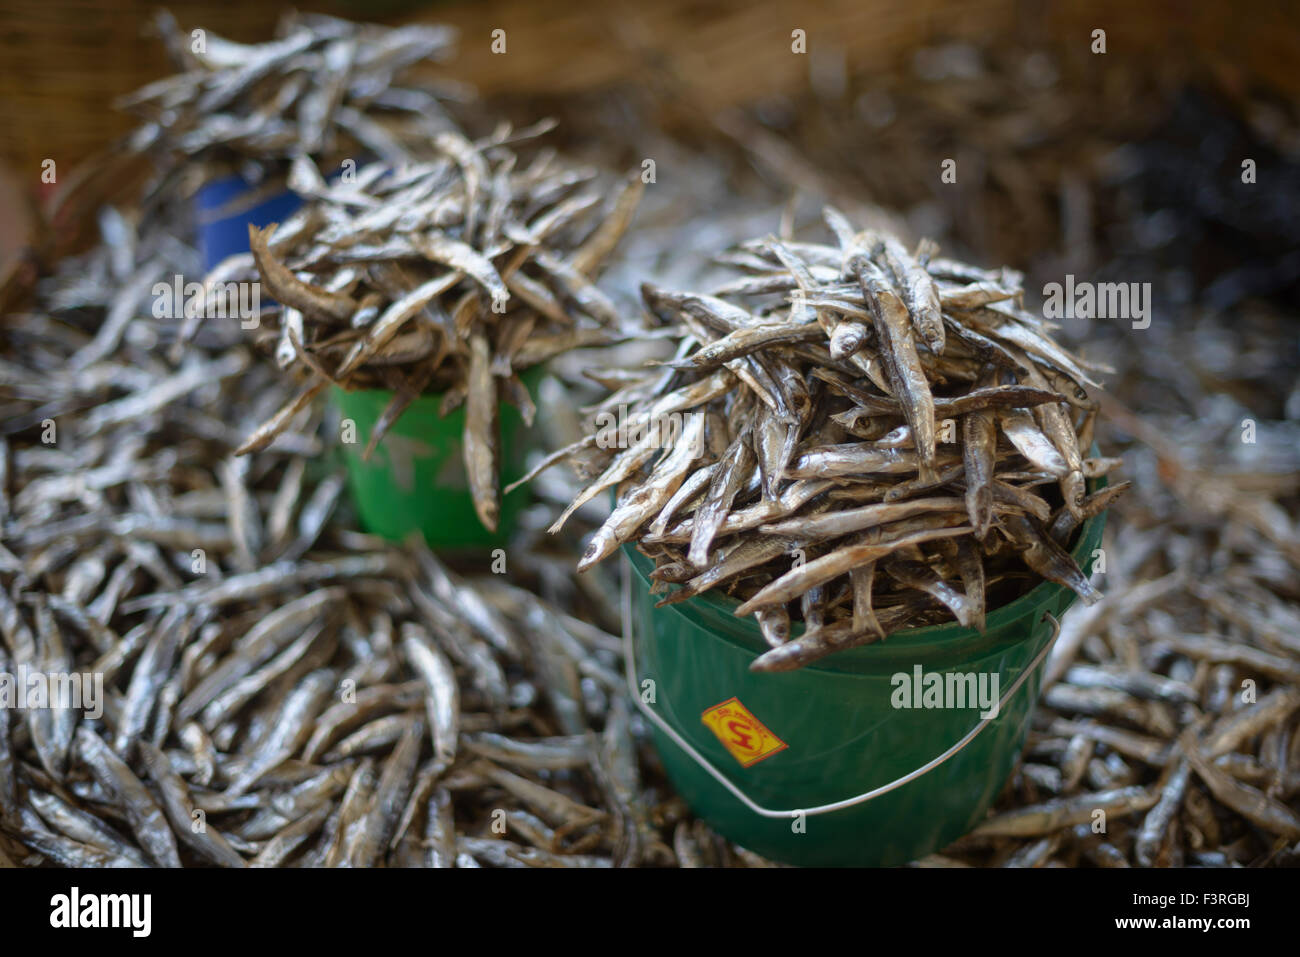 Open-air fish market at the Lake Malawi, Malawi, Africa - Stock Image